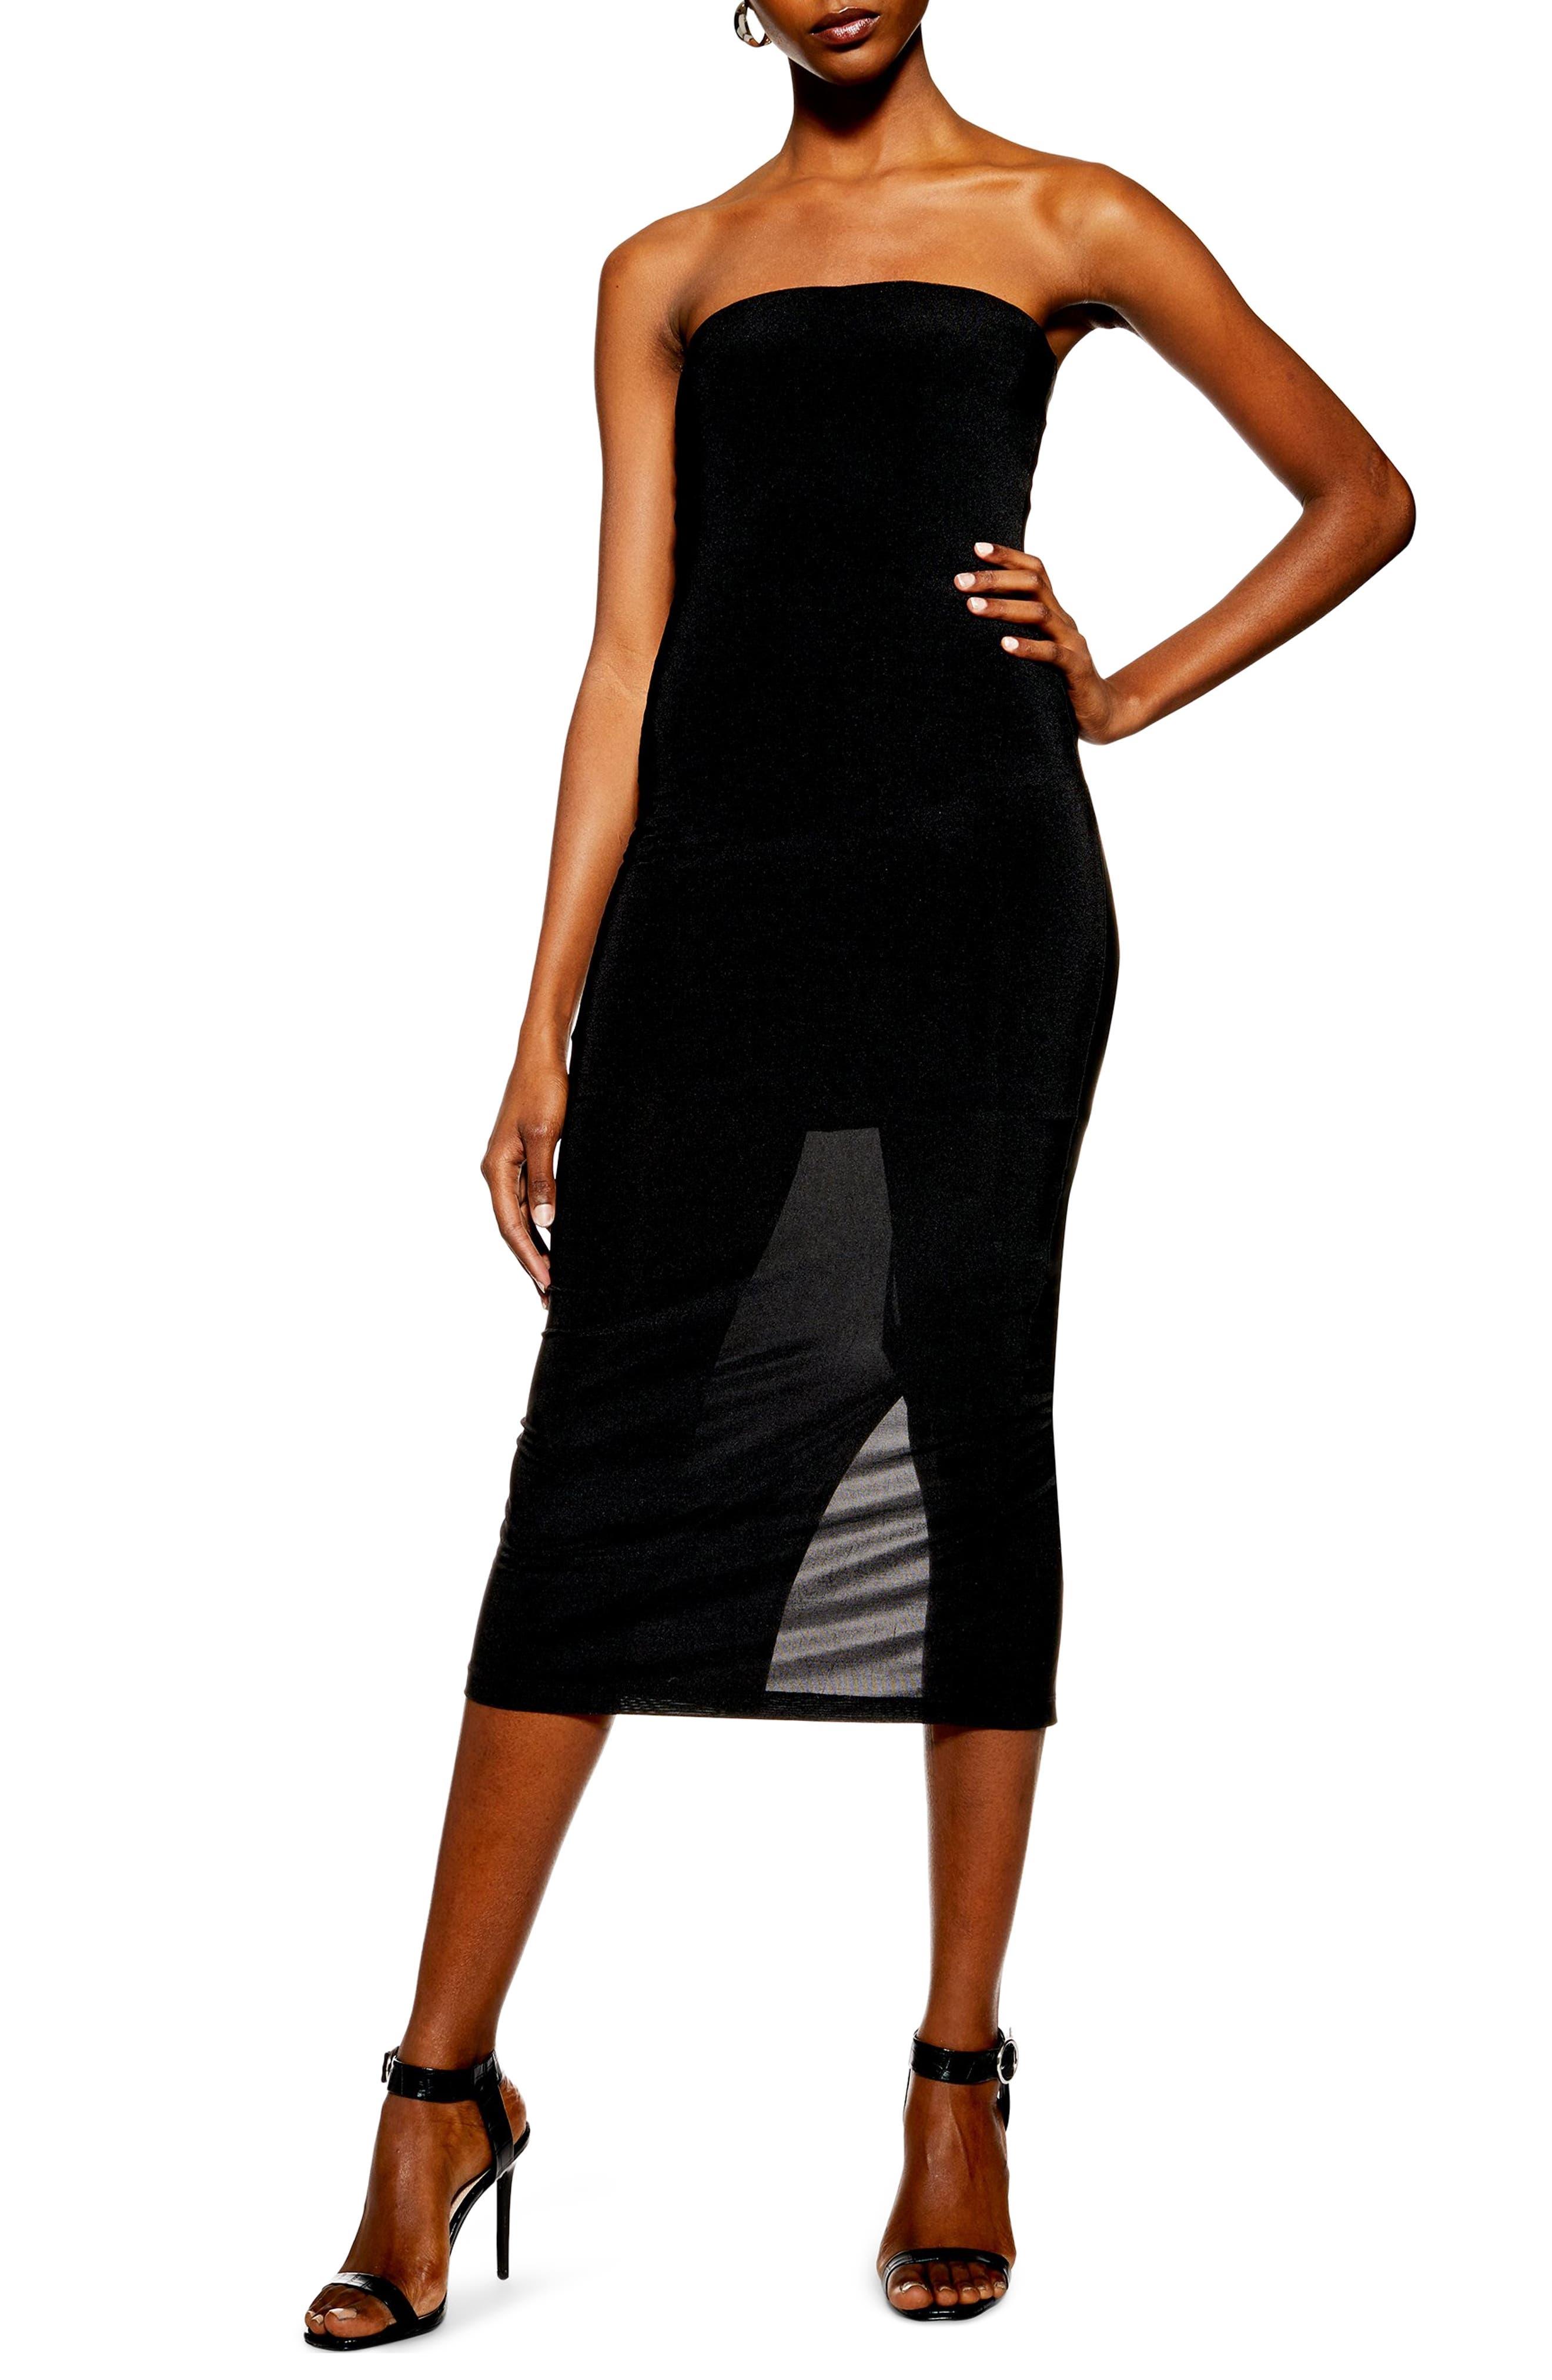 Topshop Slinky Strapless Midi Dress, US (fits like 2-4) - Black